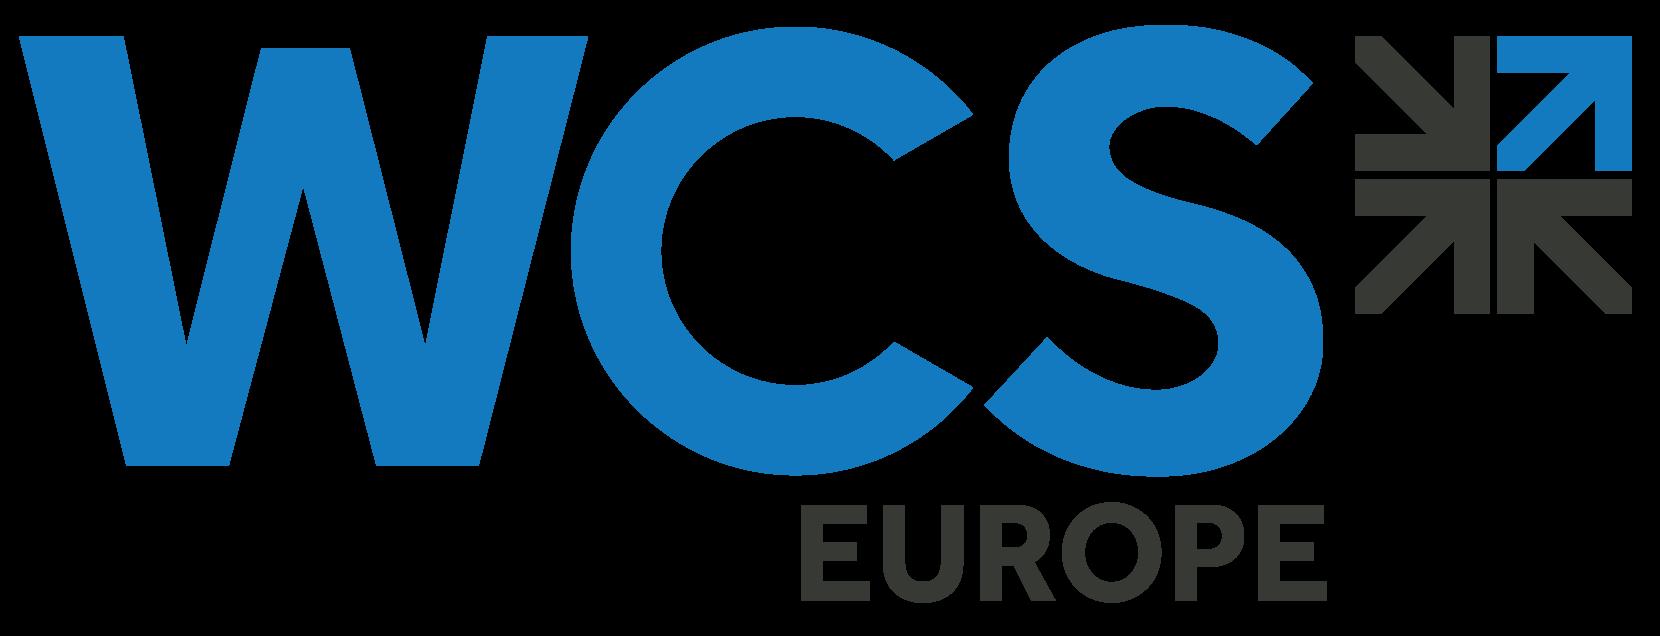 Wcs Logo - Thinkrf